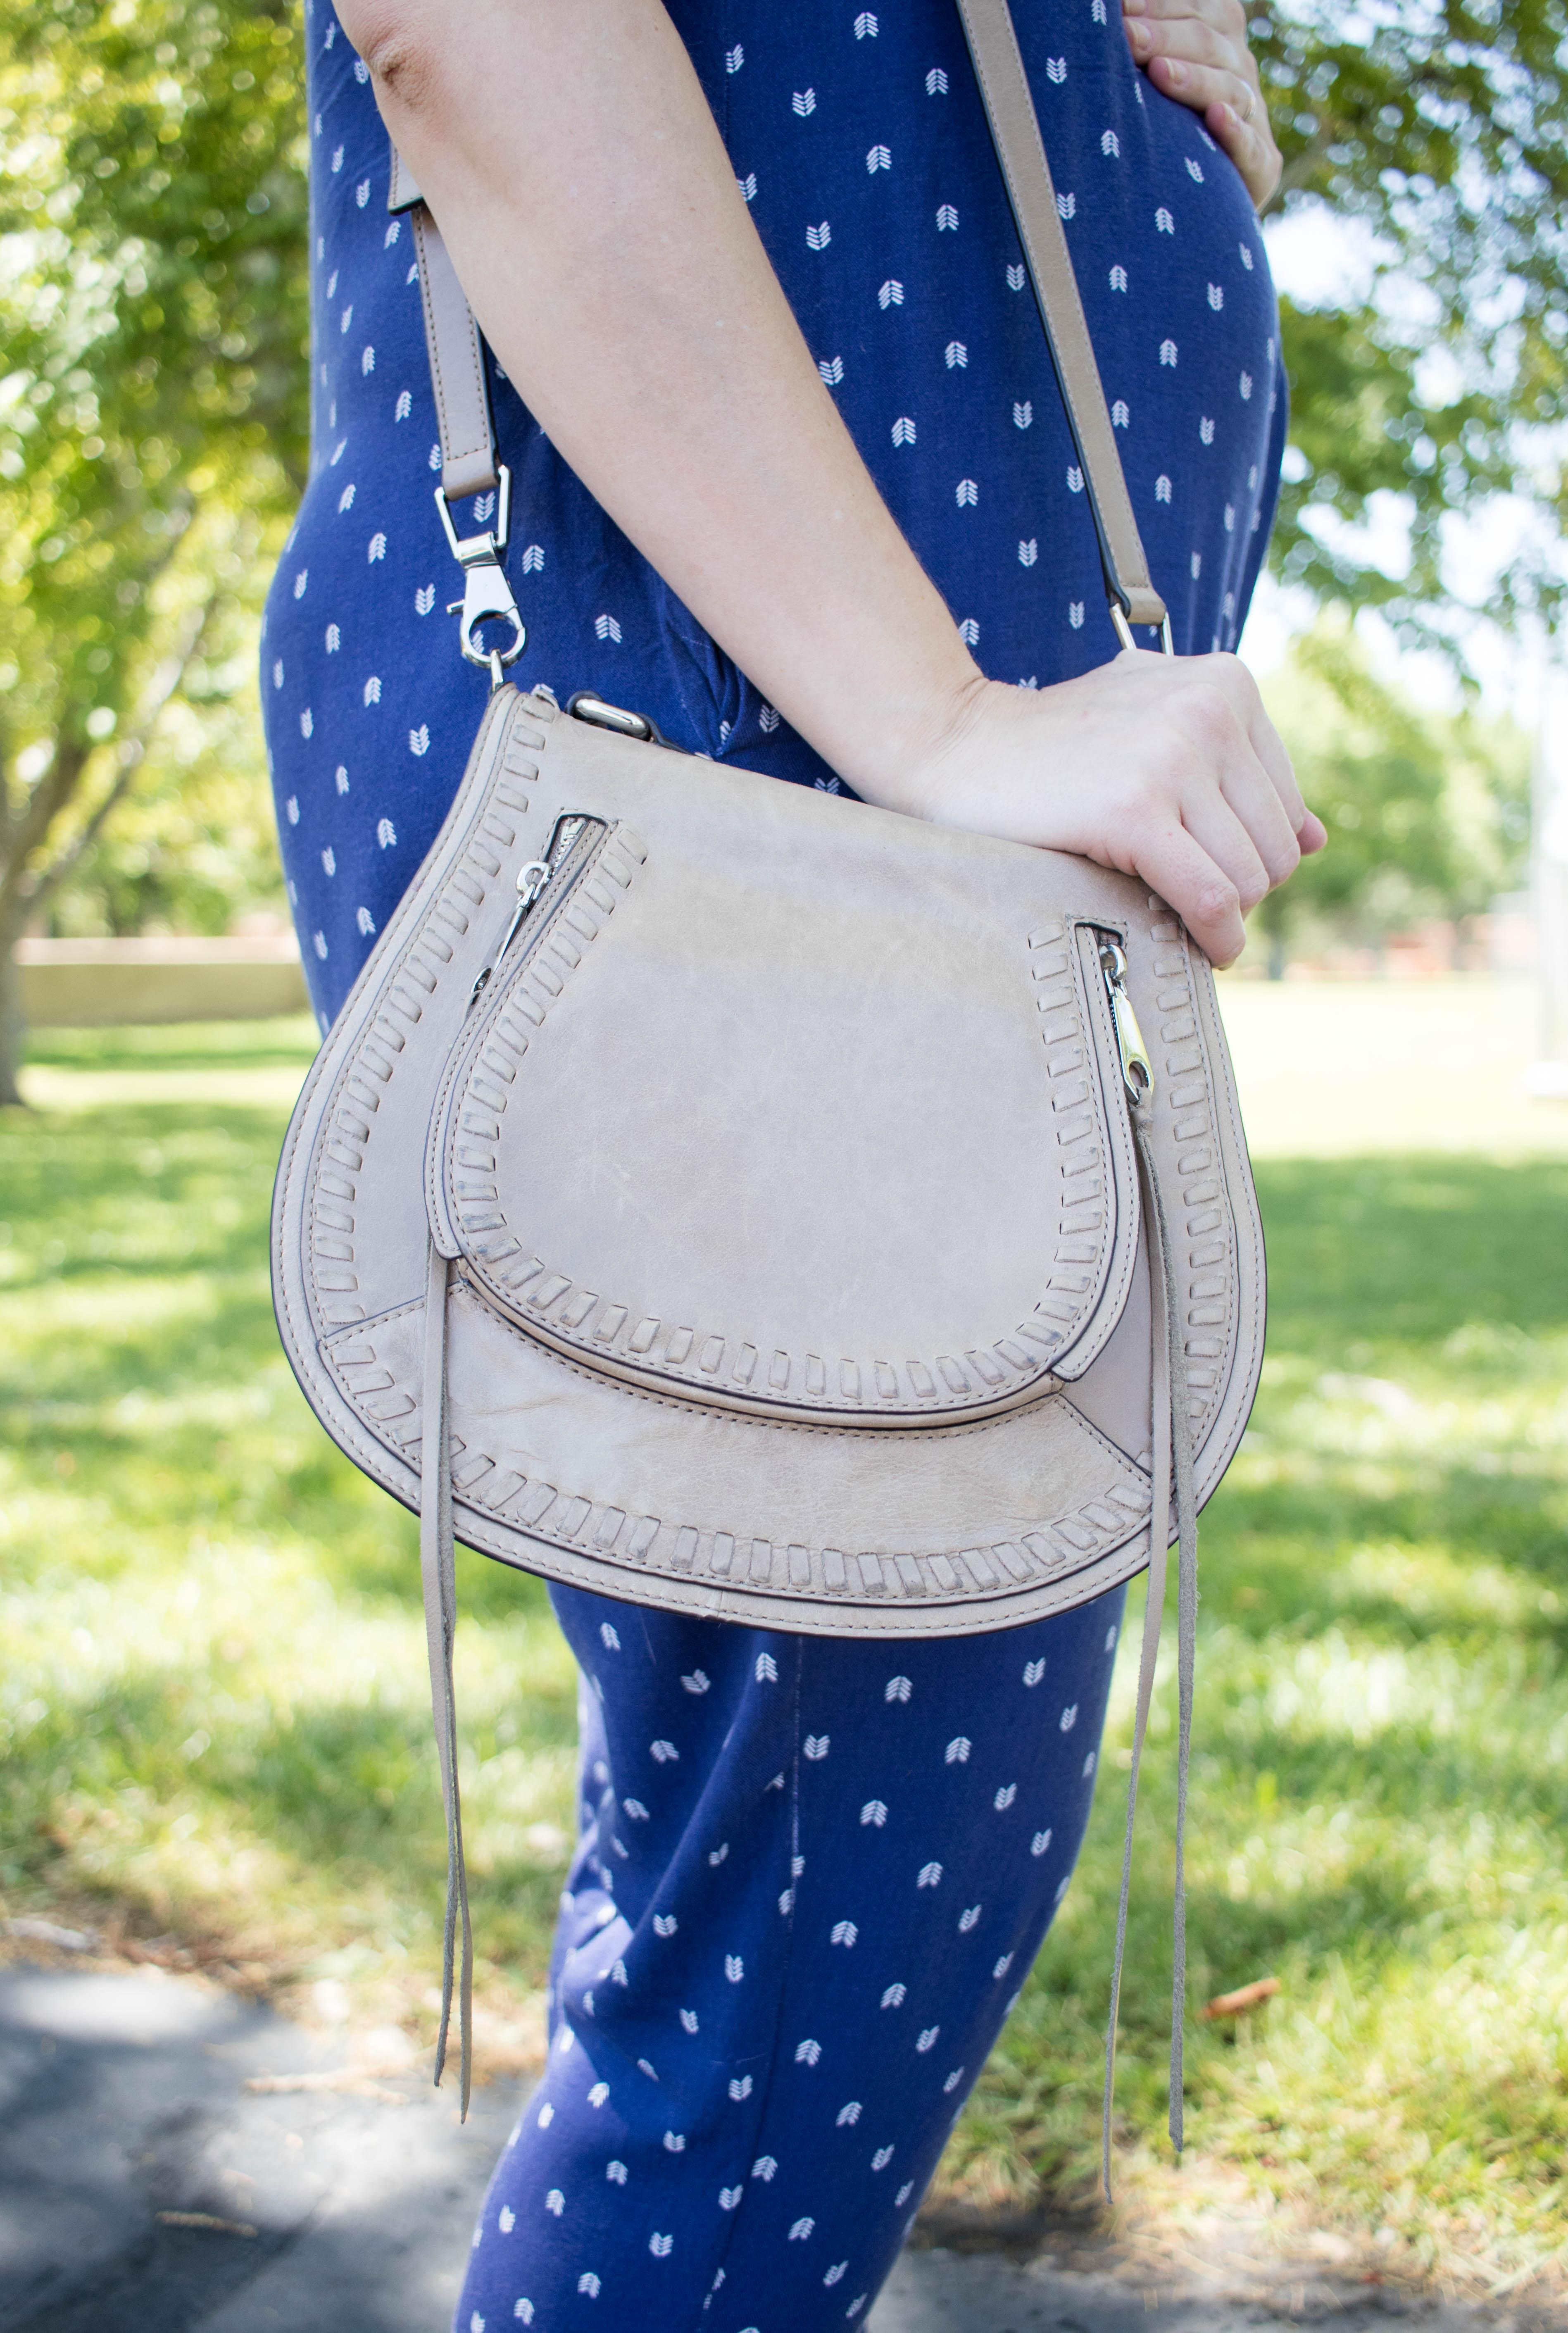 Rebecca minkoff saddle bag #myrm #rebeccaminkoff #outfitdetails